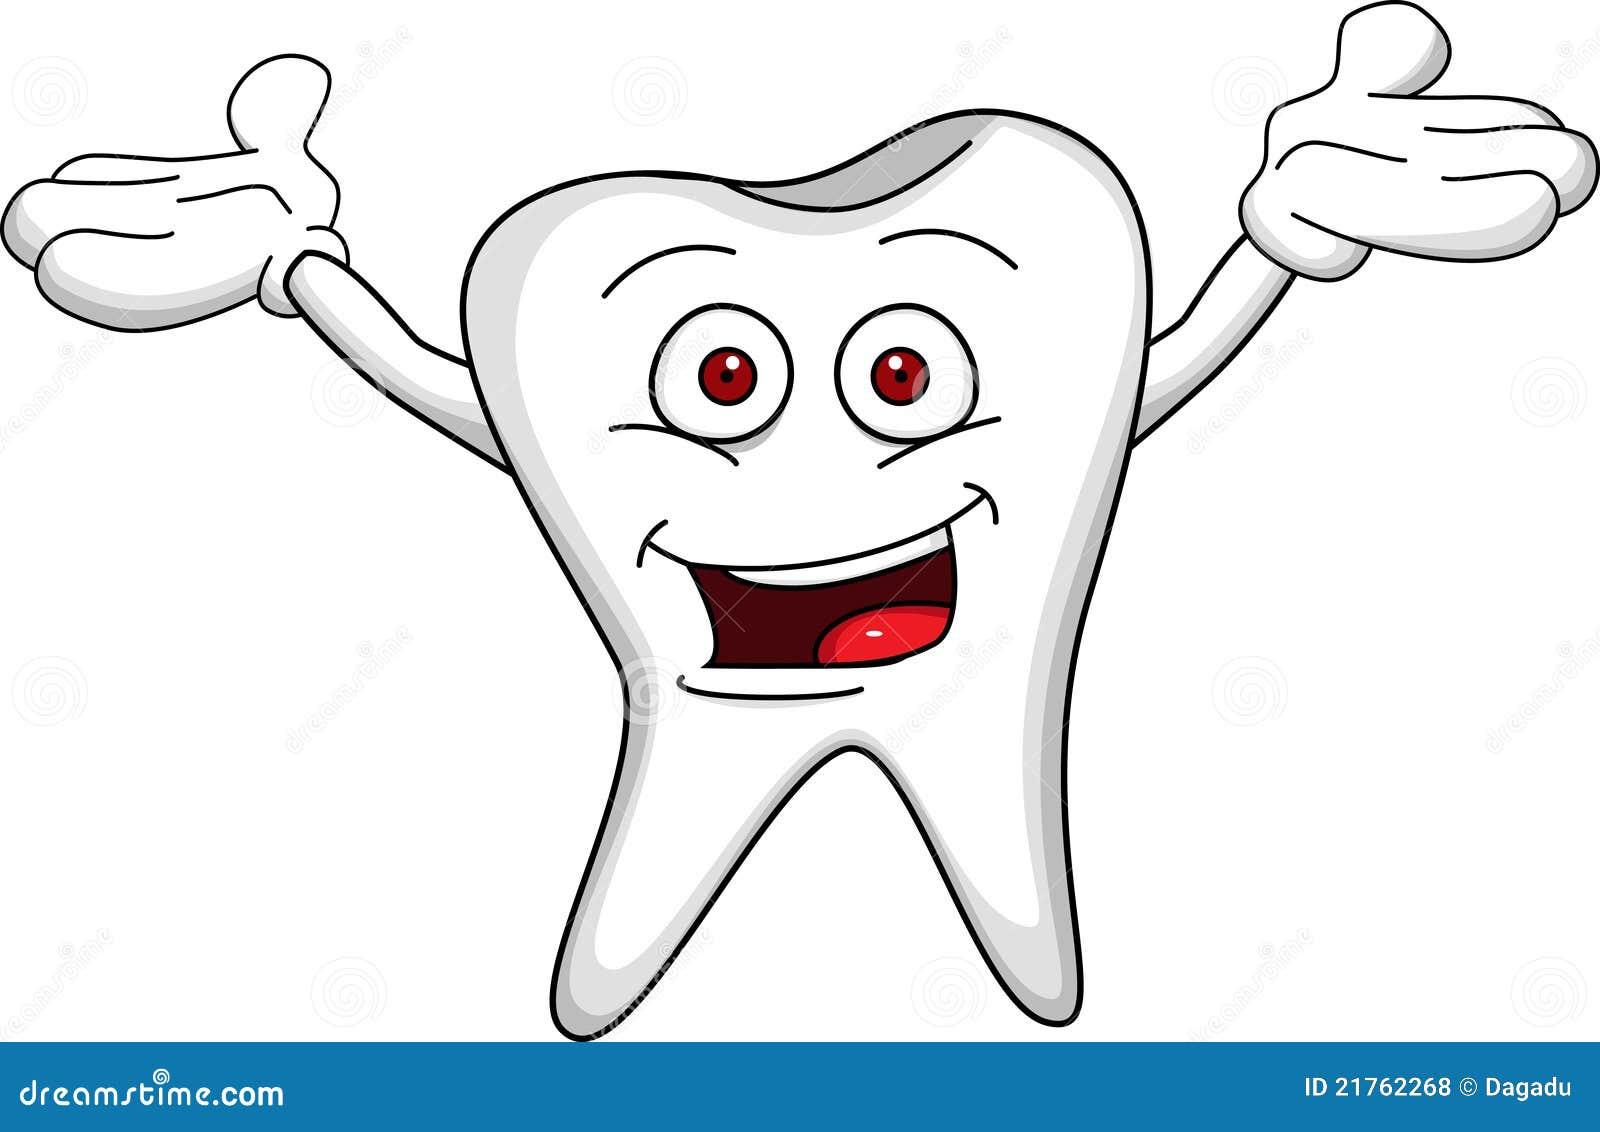 Photos libres de droits tooth cartoon image 21762268 - Dessin de dent ...